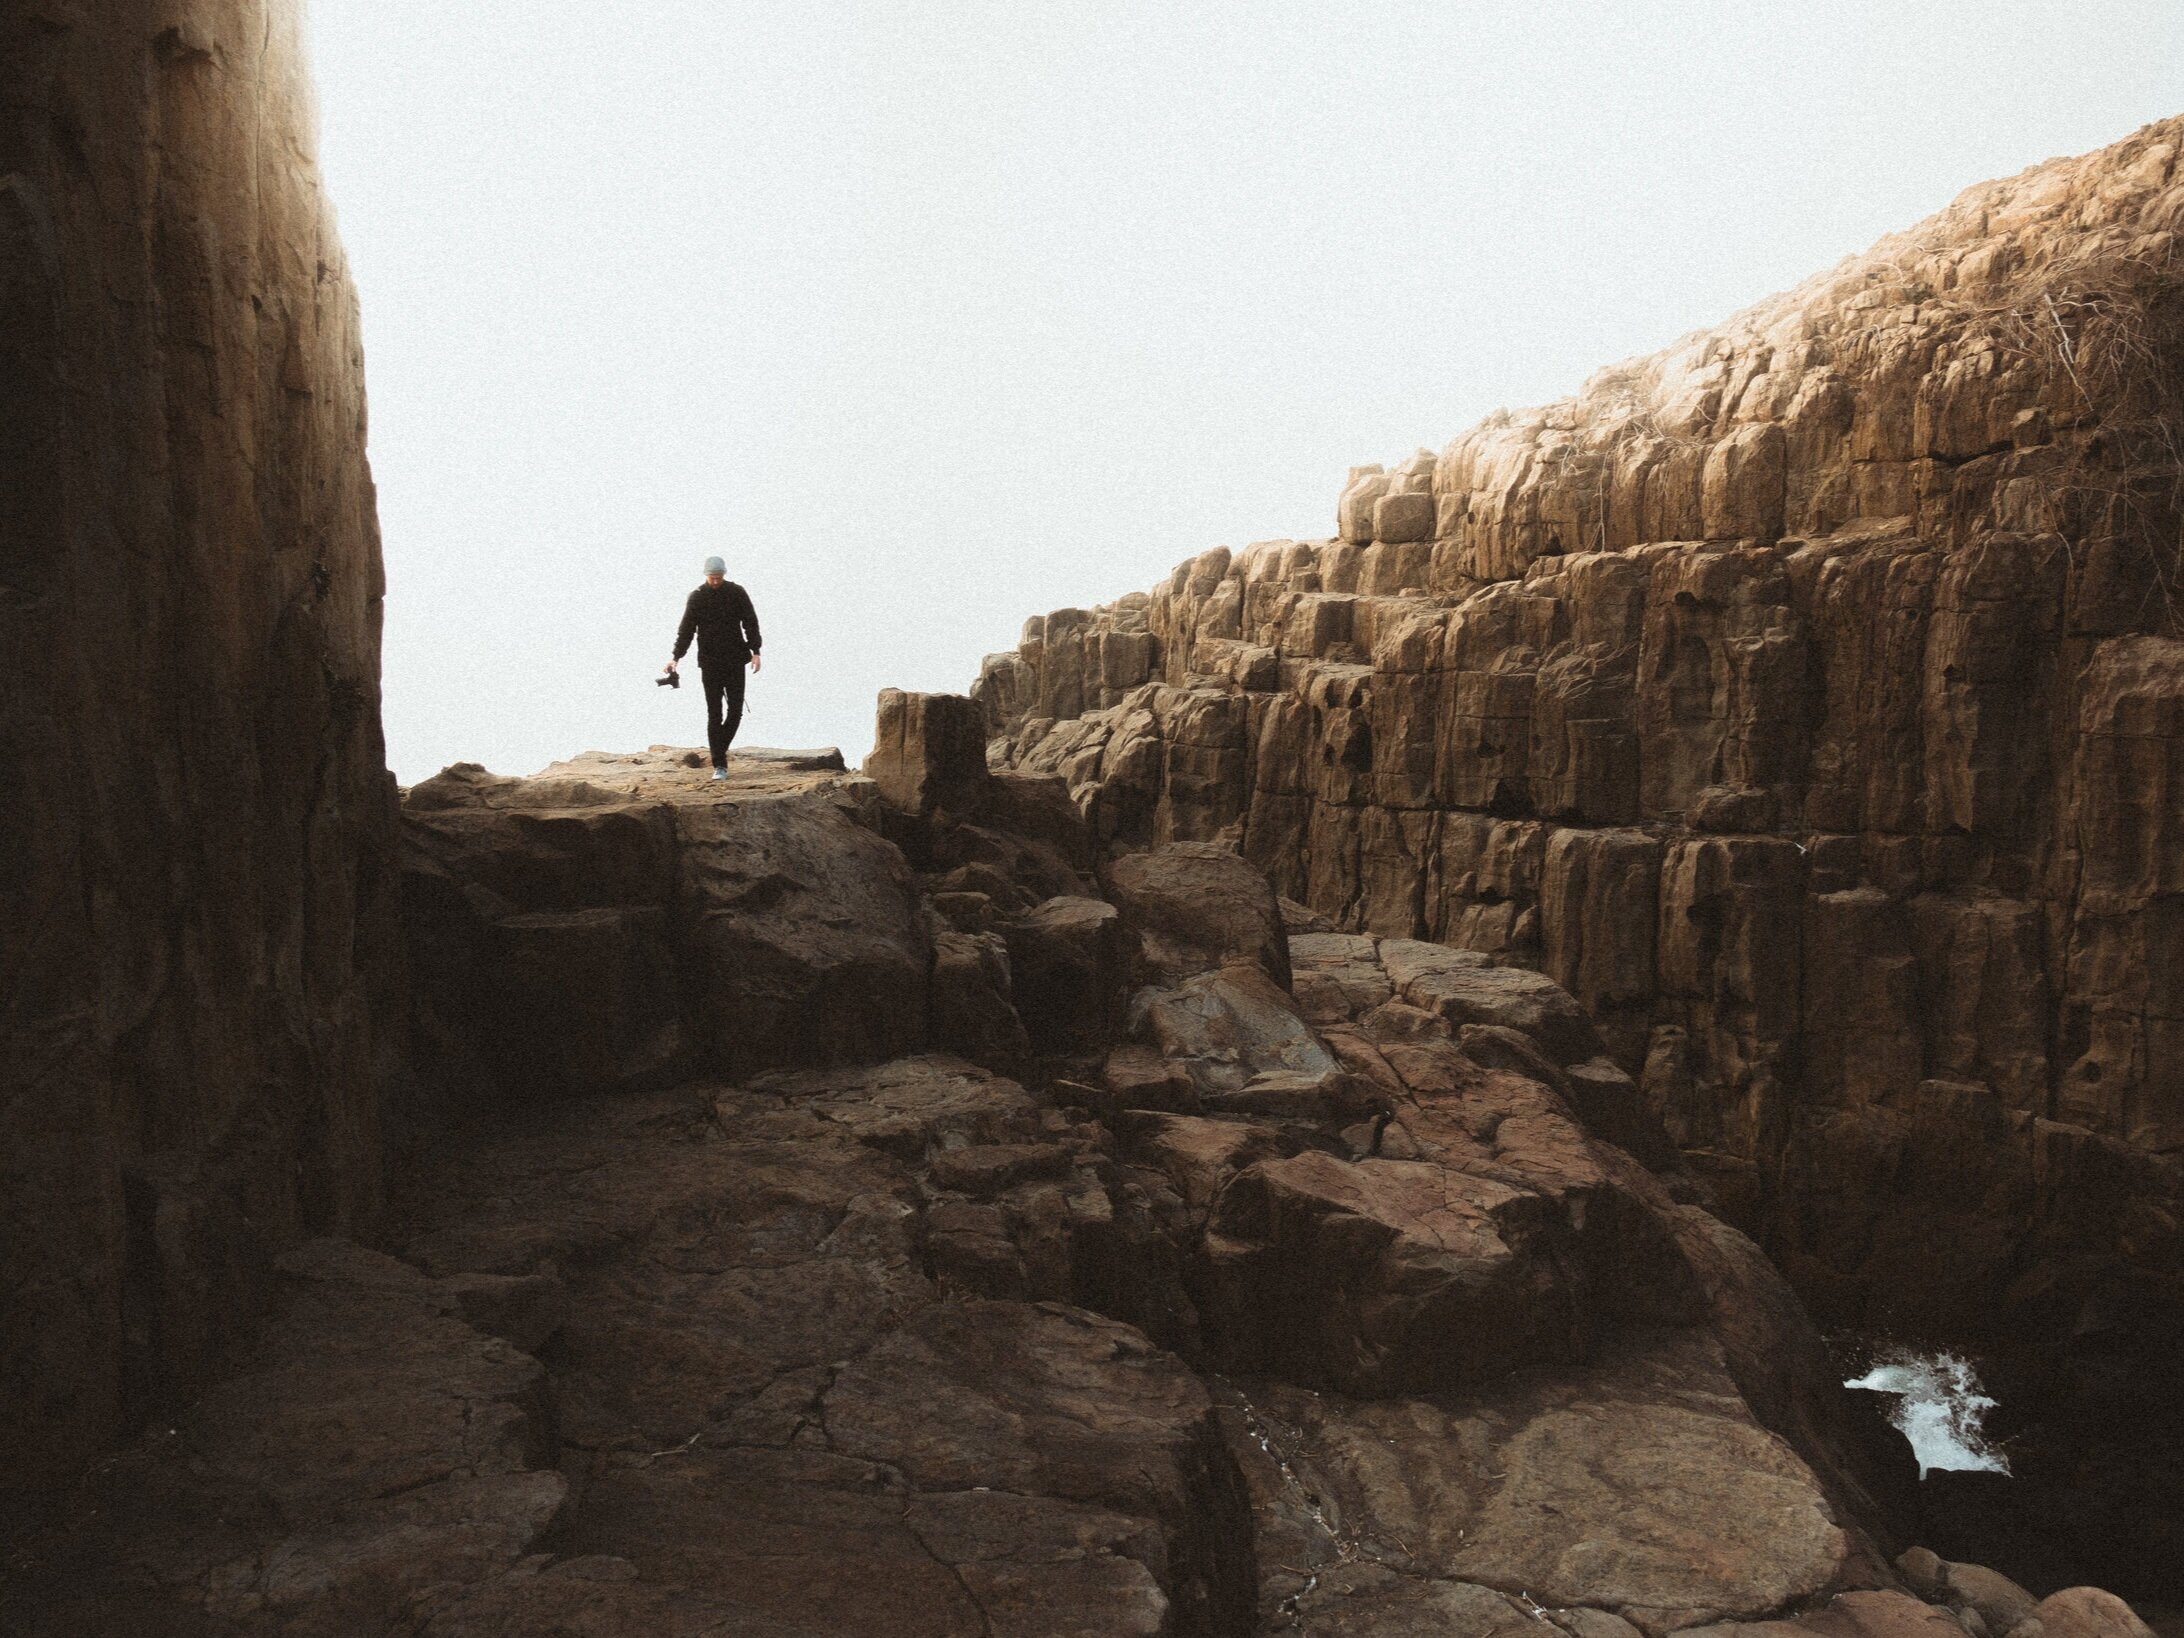 We explored the cliffs of Tojinbo, a hidden gem on the northern coast of Honshu, Japan's main island.